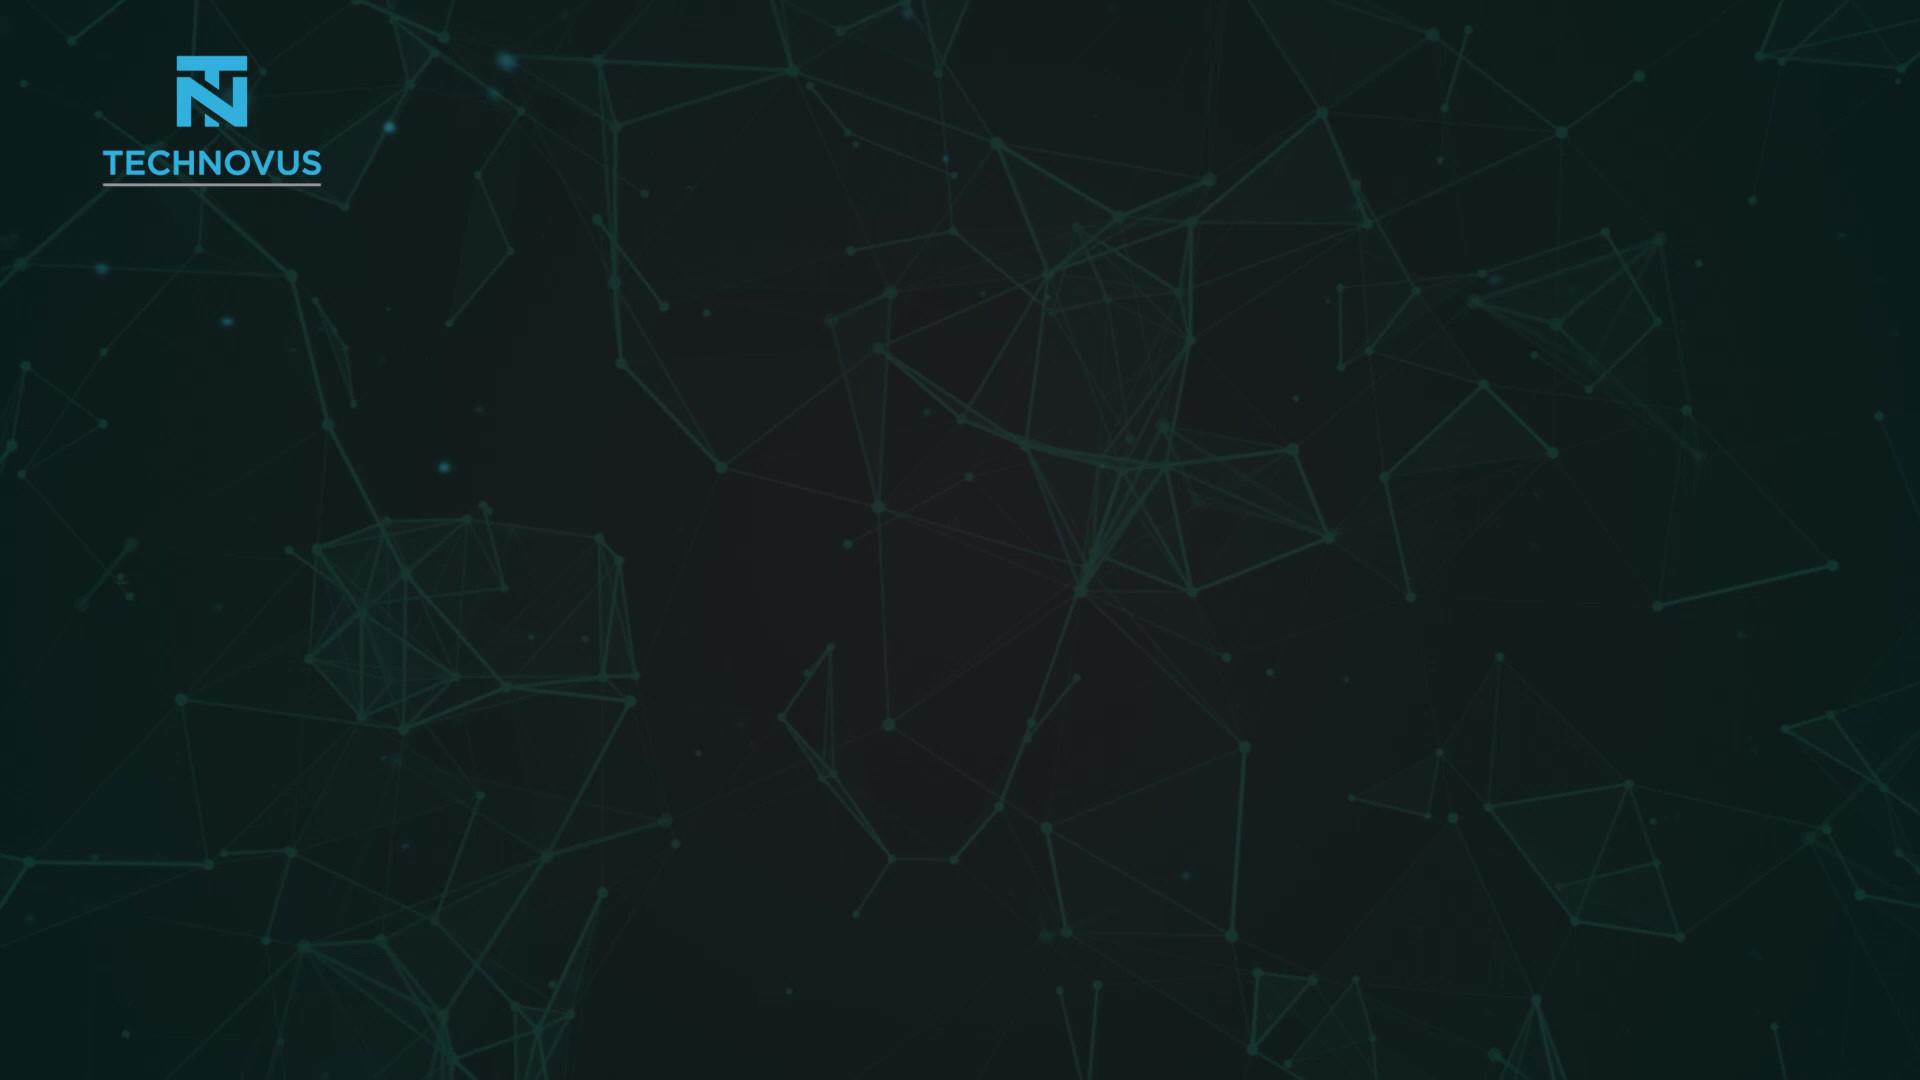 TechNovus Ideas Laboratory